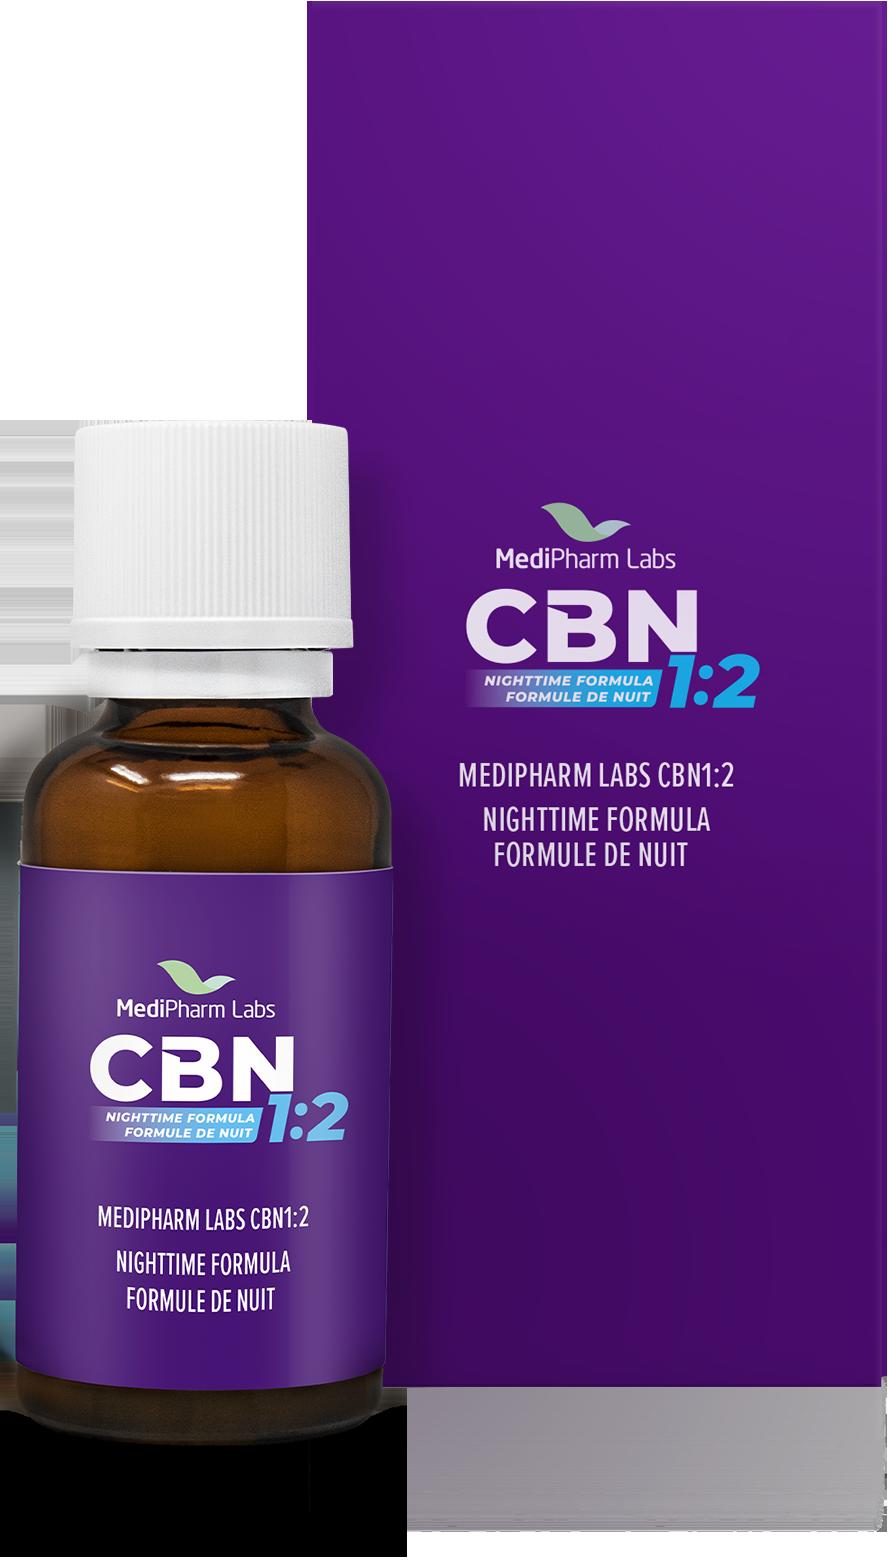 CBN1:2 Nighttime Formula